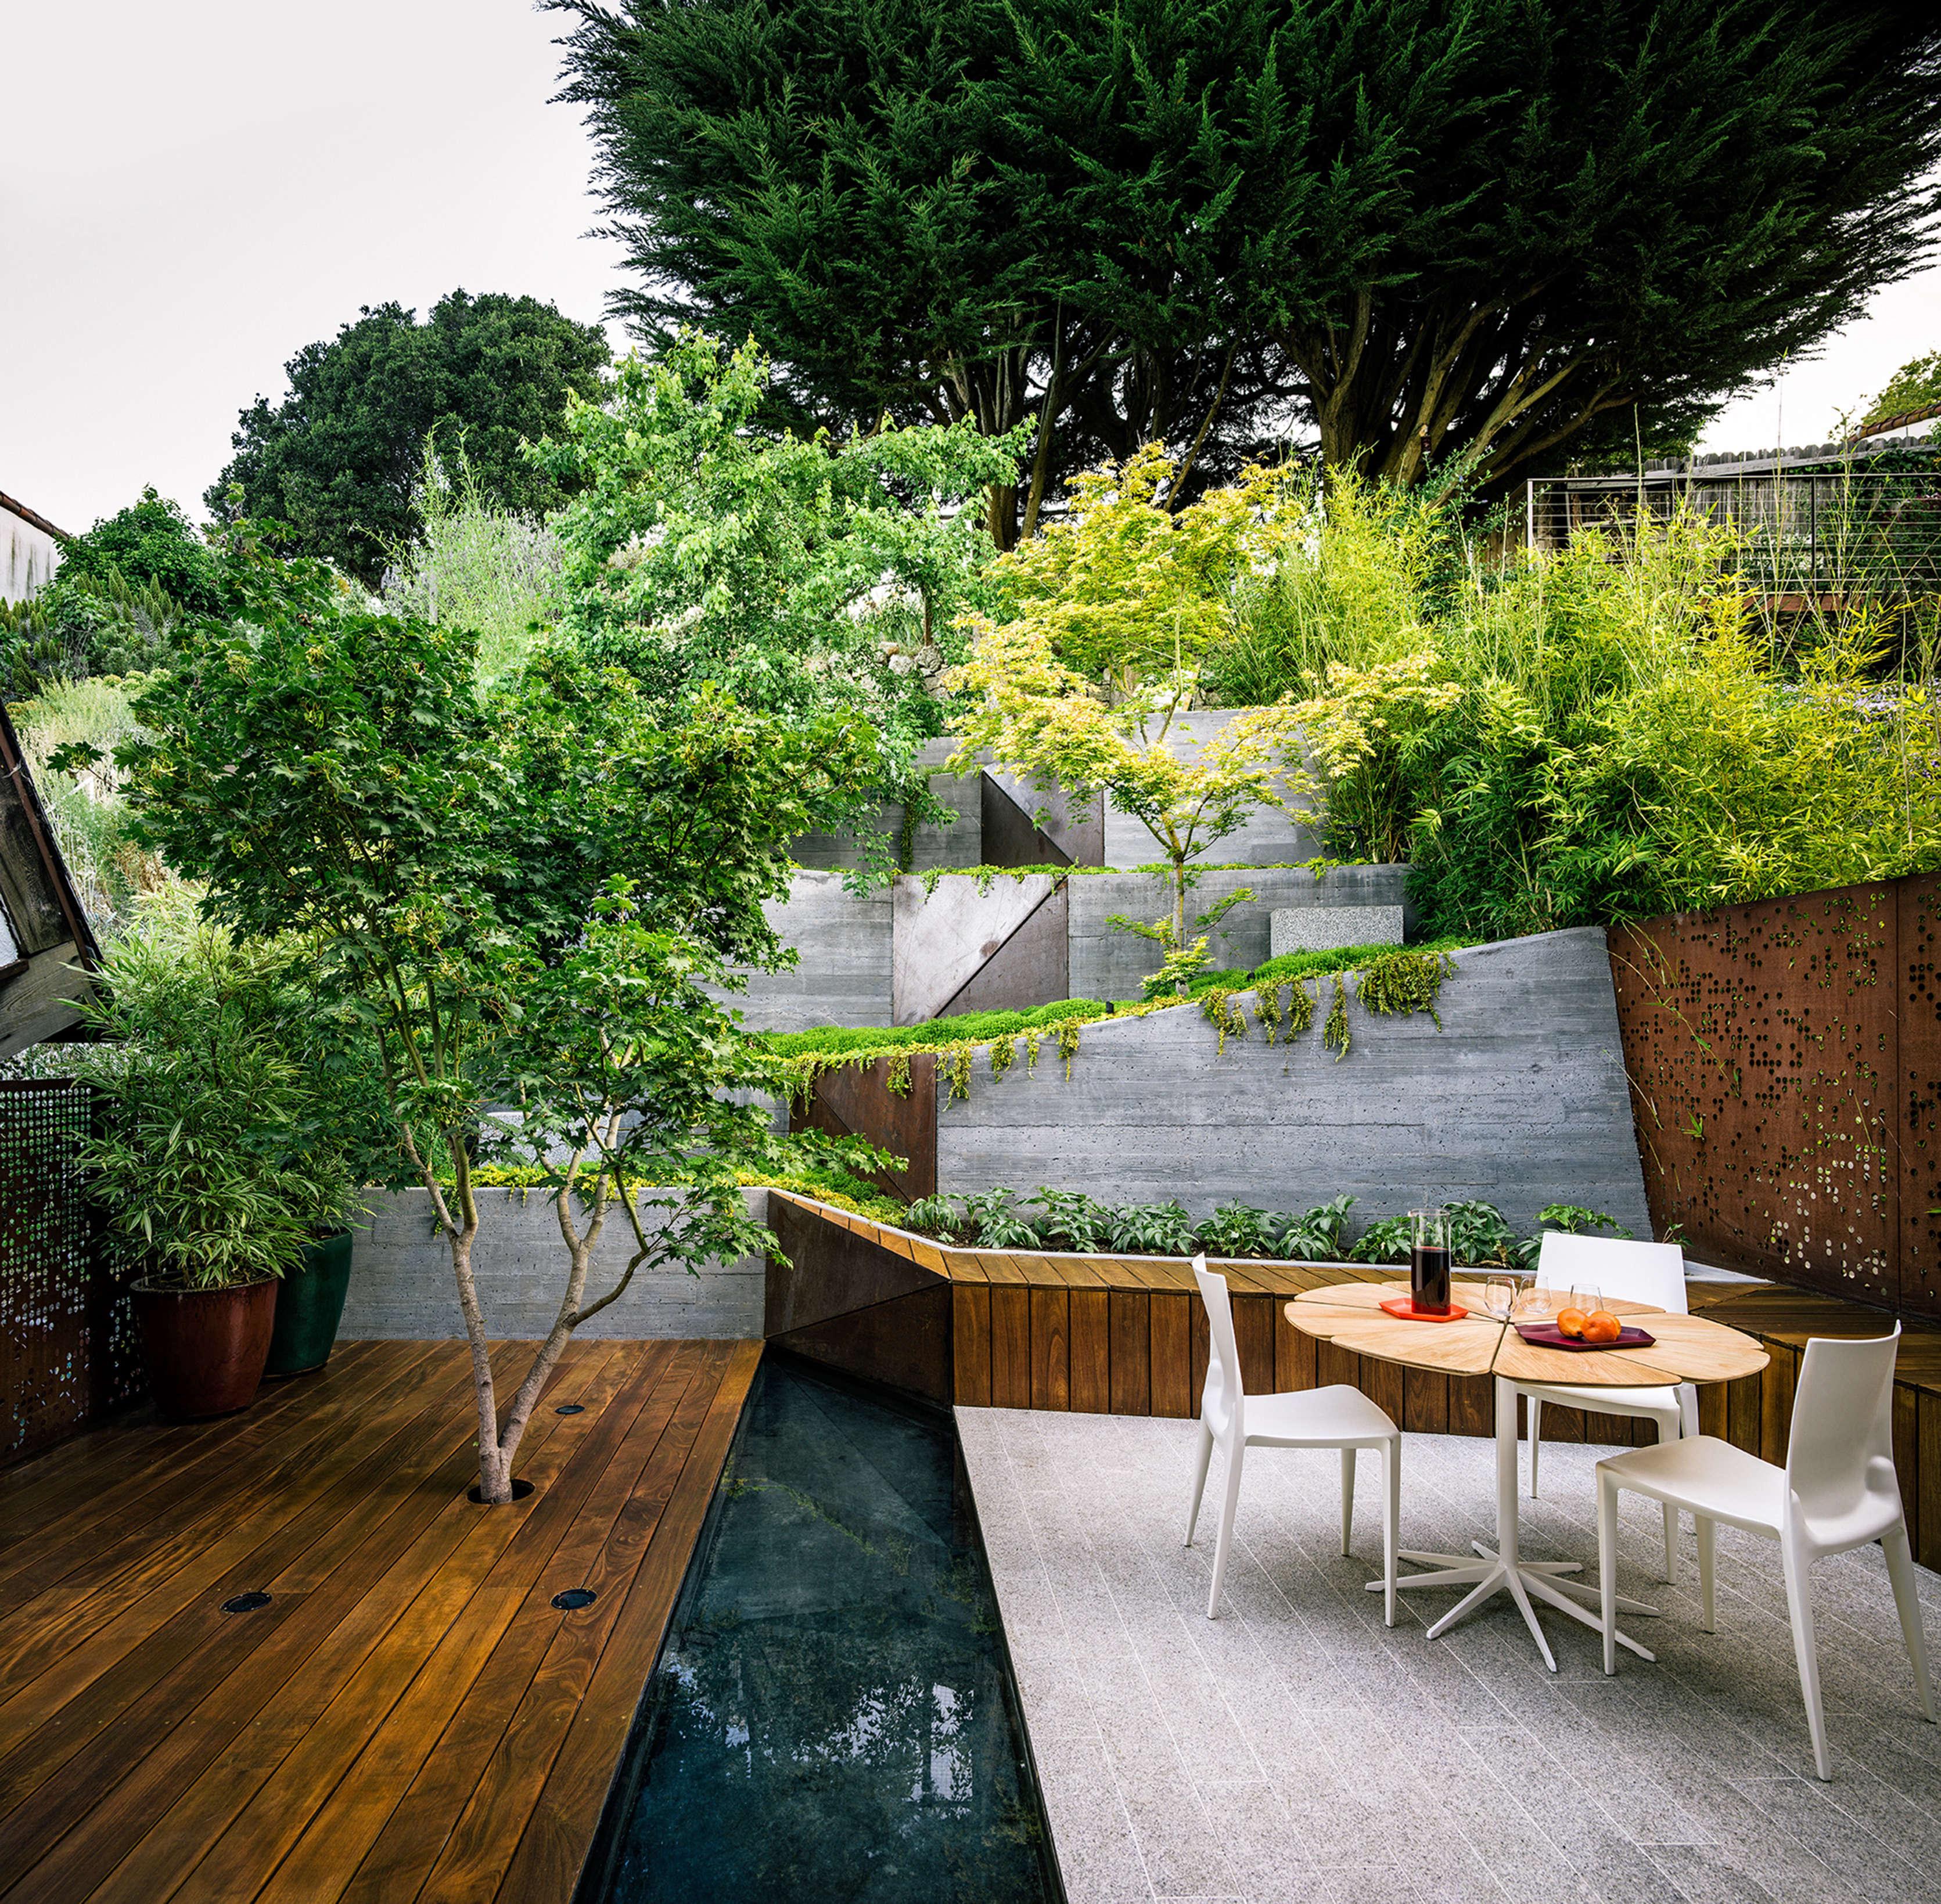 Evergreen Book Garden by Mary Barensfeld Architecture, Photo by Joe Fletcher